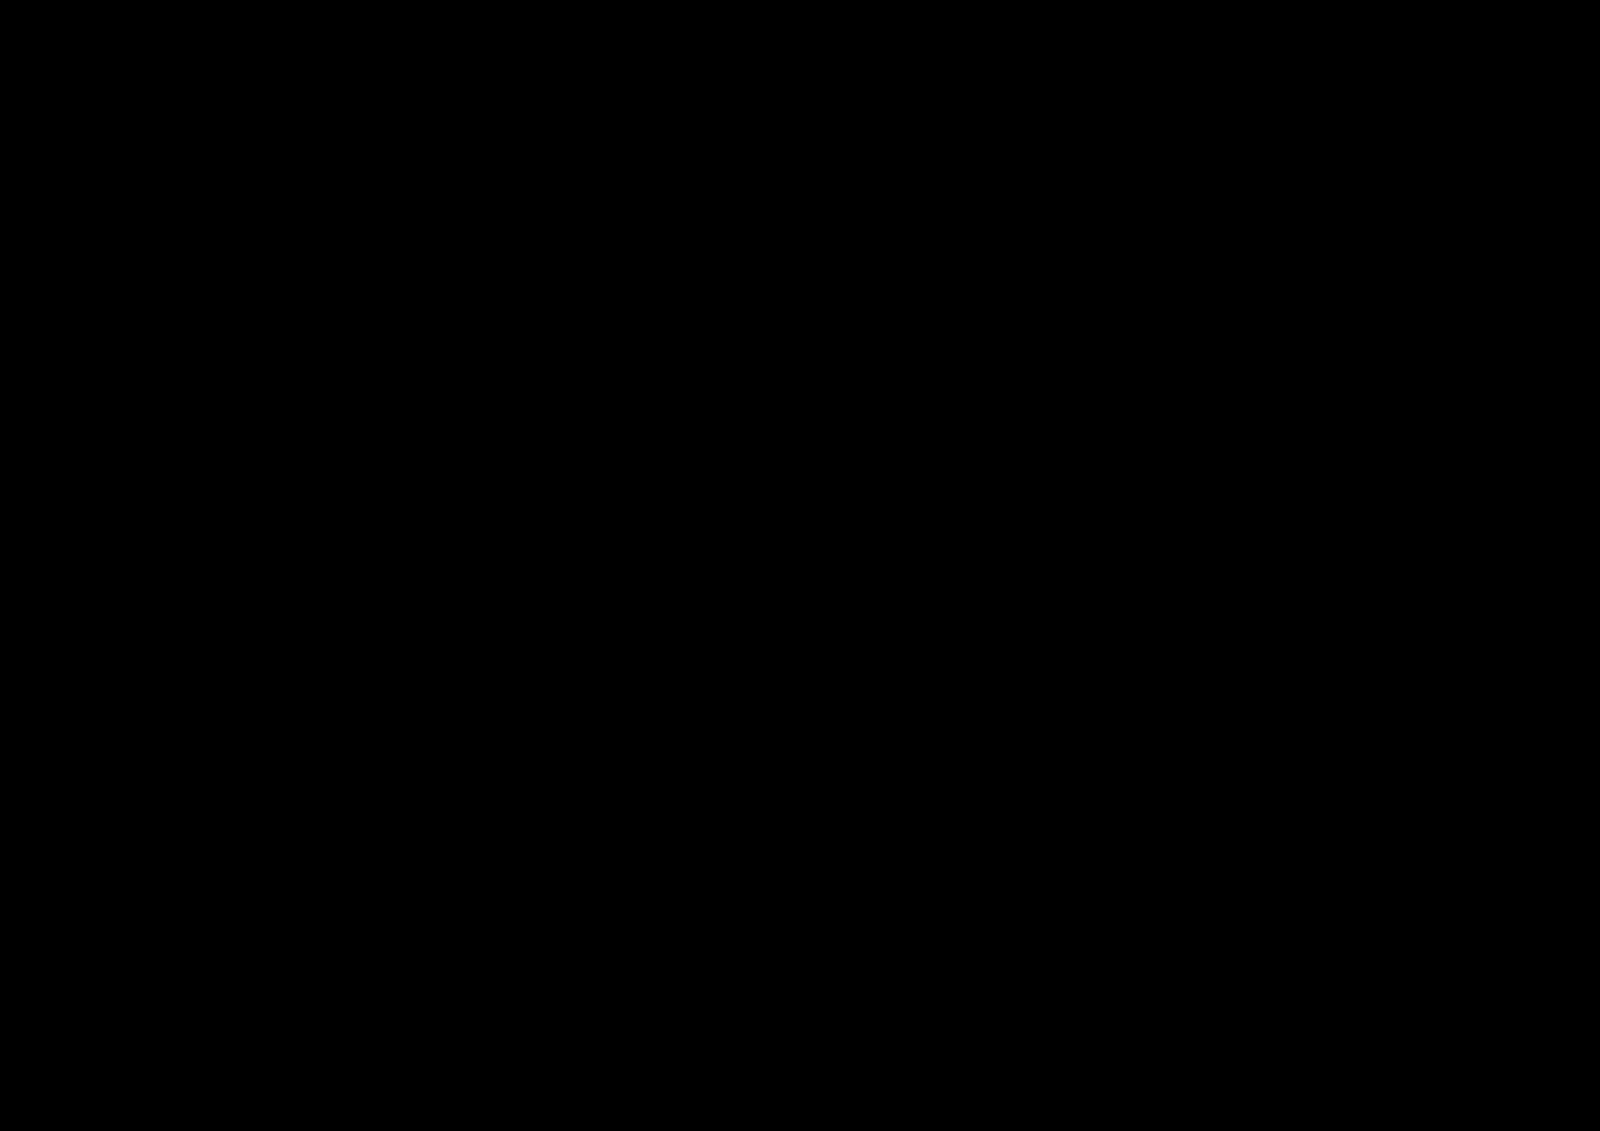 Blue Ant SVG Clip arts